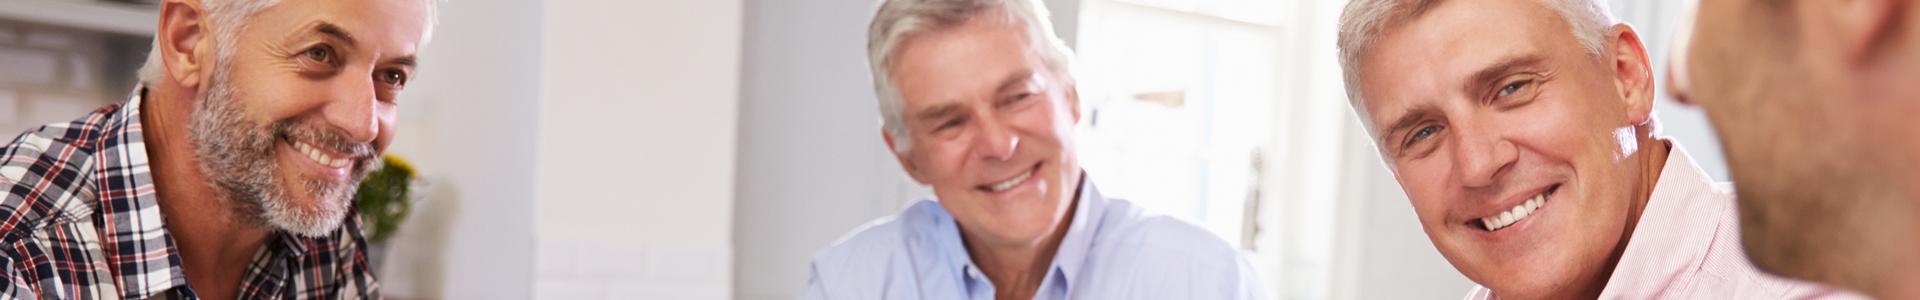 groupe-homme avec cancer prostate